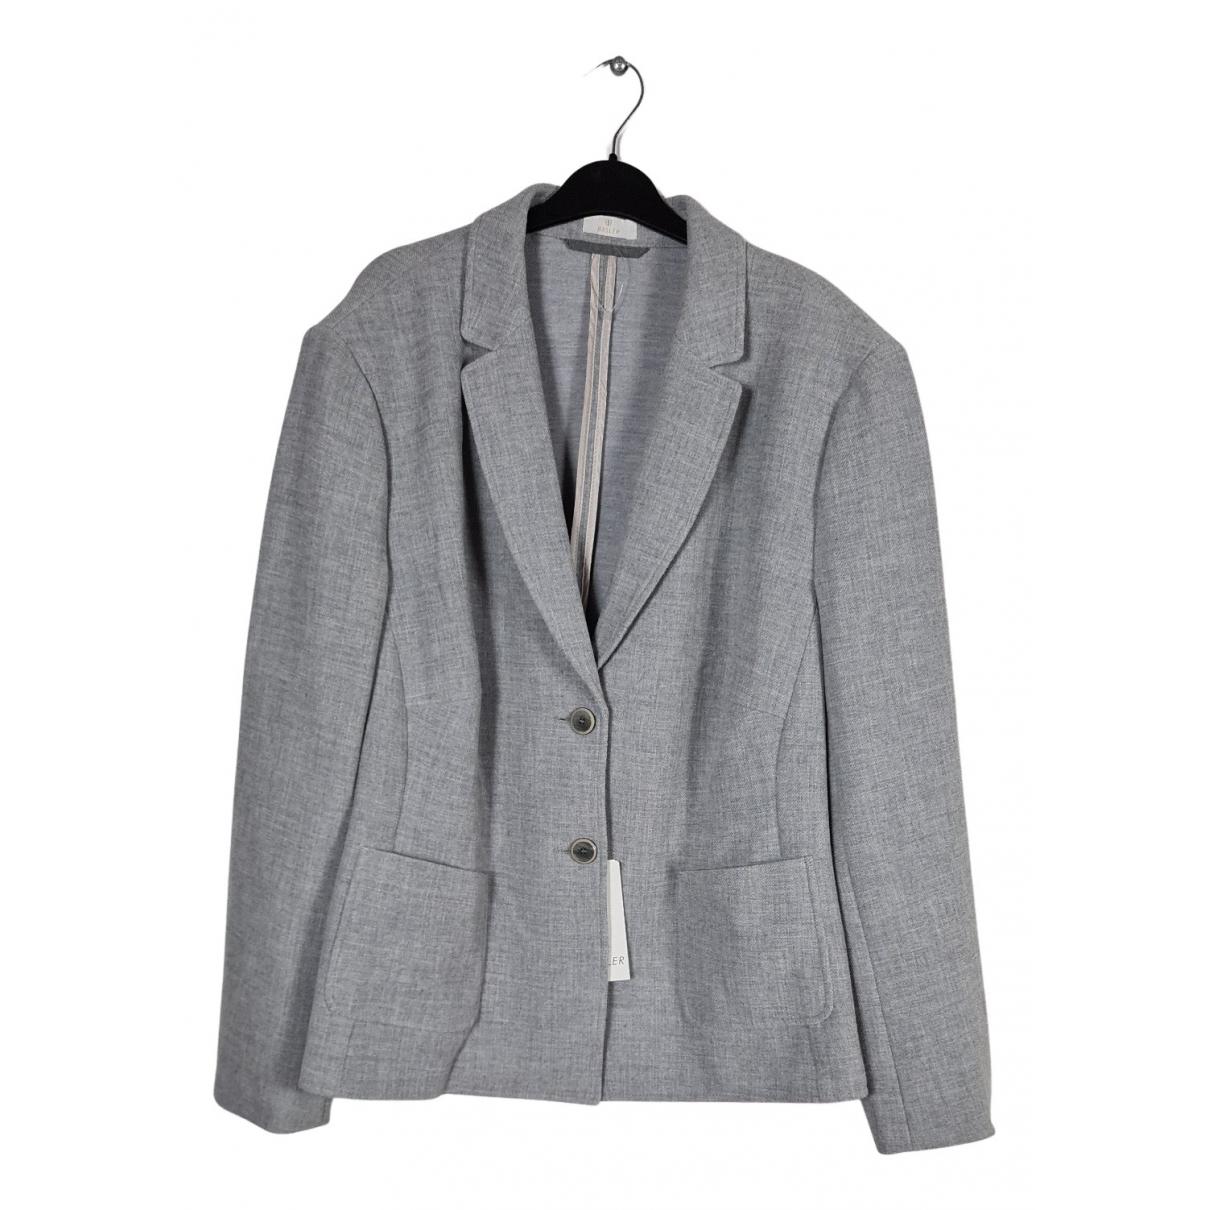 Basler \N Jacke in  Grau Polyester